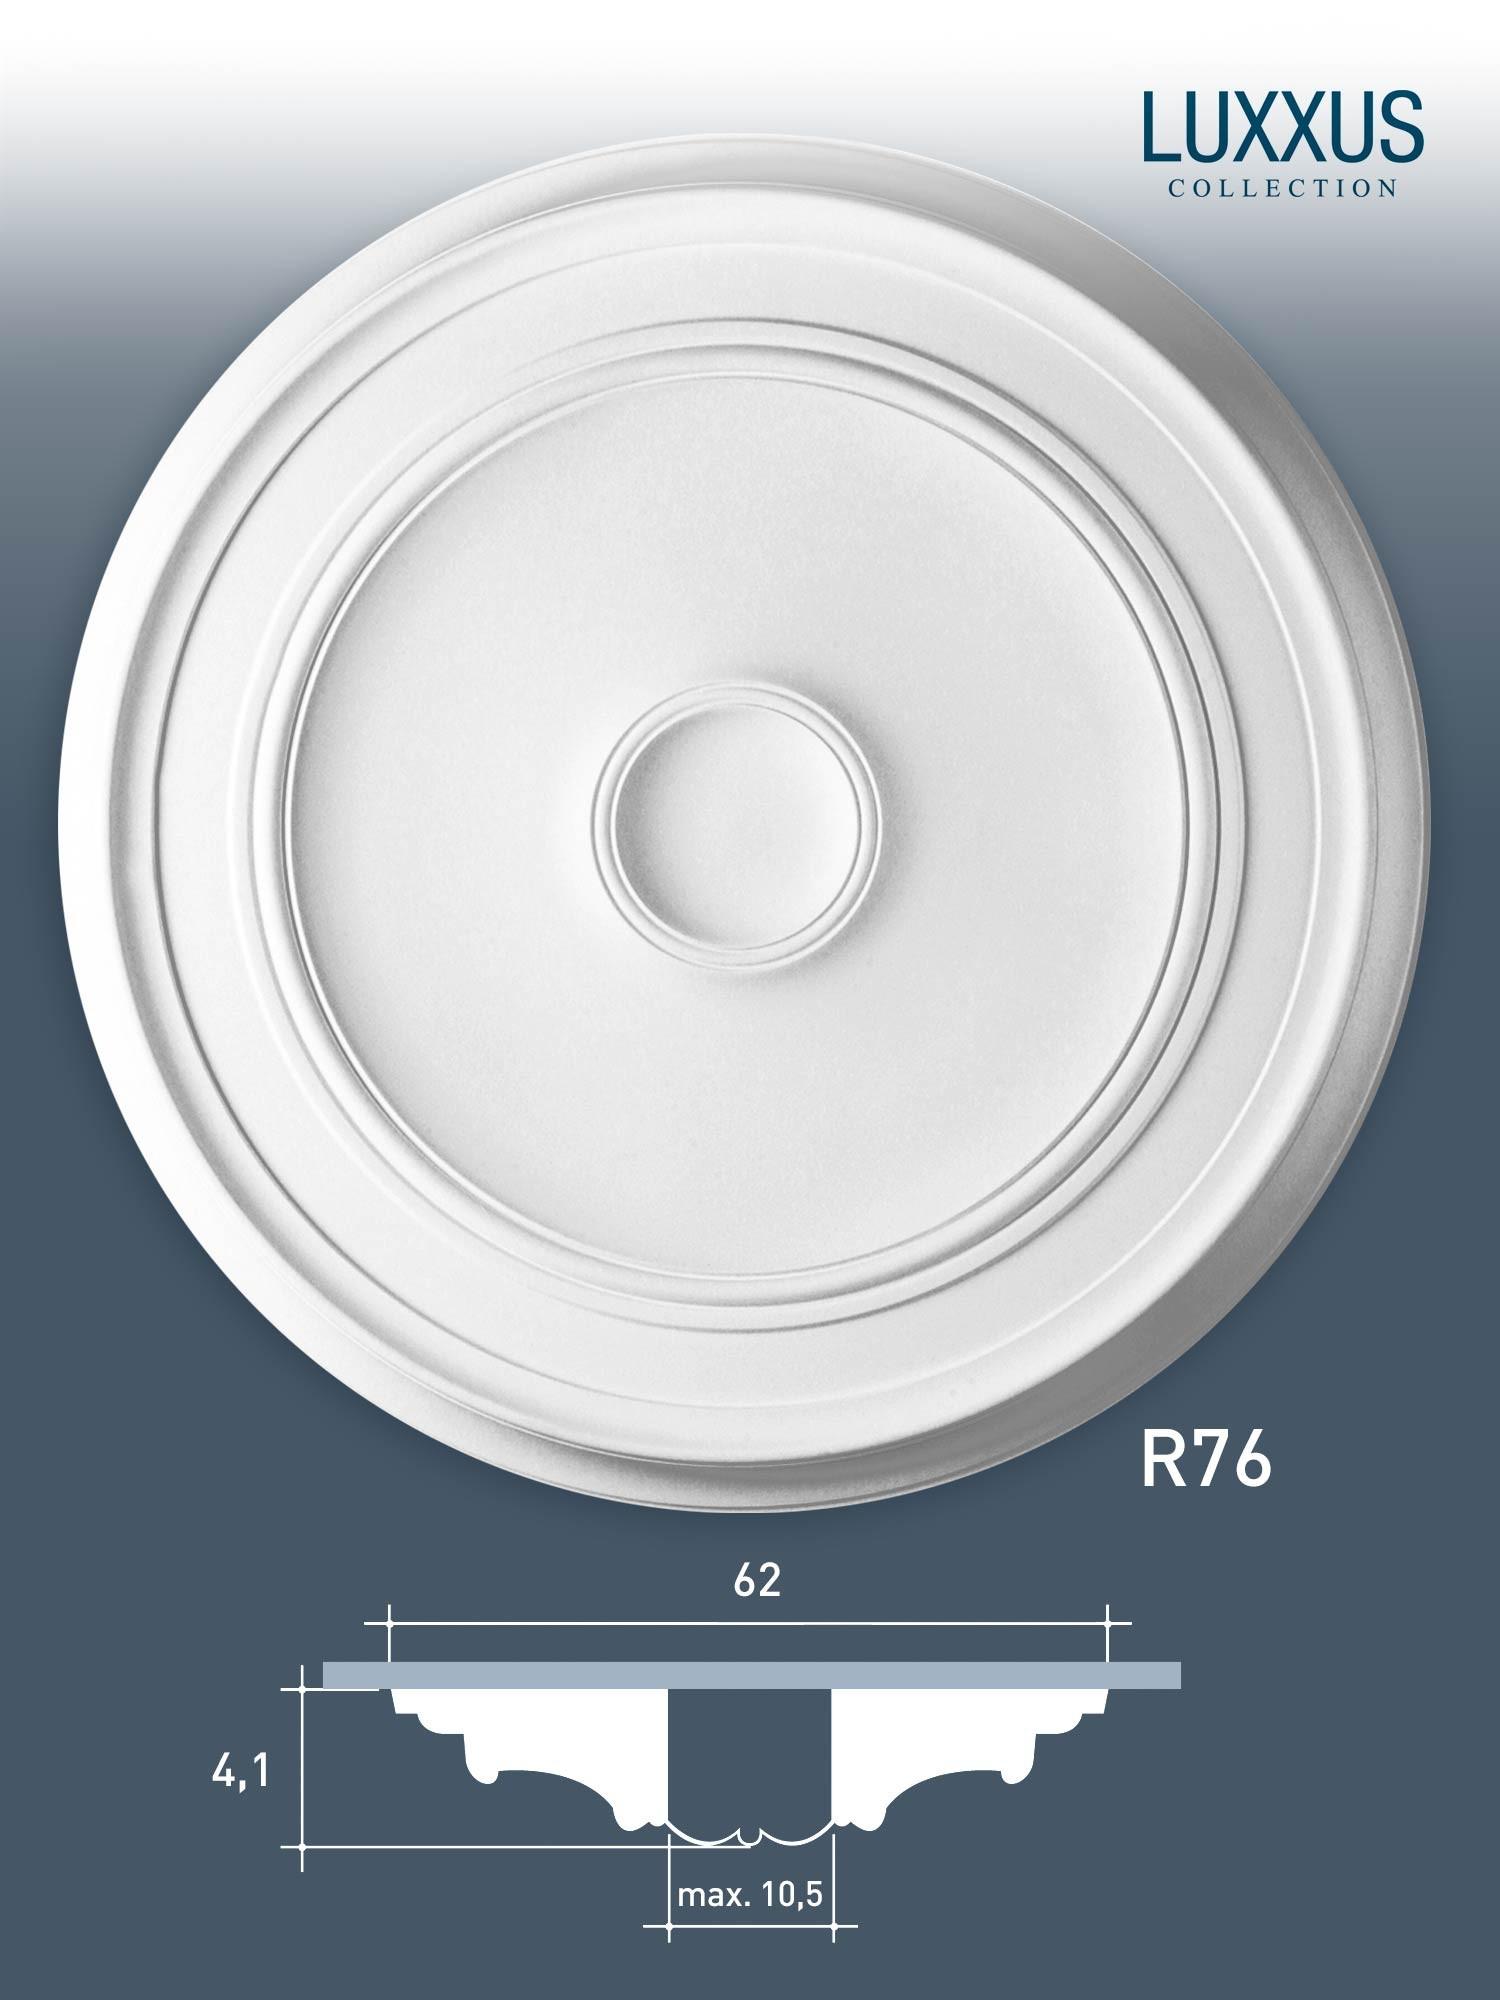 deckenrosette medallion orac decor r76 luxxus stuck rosette lampenschirm 62 cm original orac. Black Bedroom Furniture Sets. Home Design Ideas